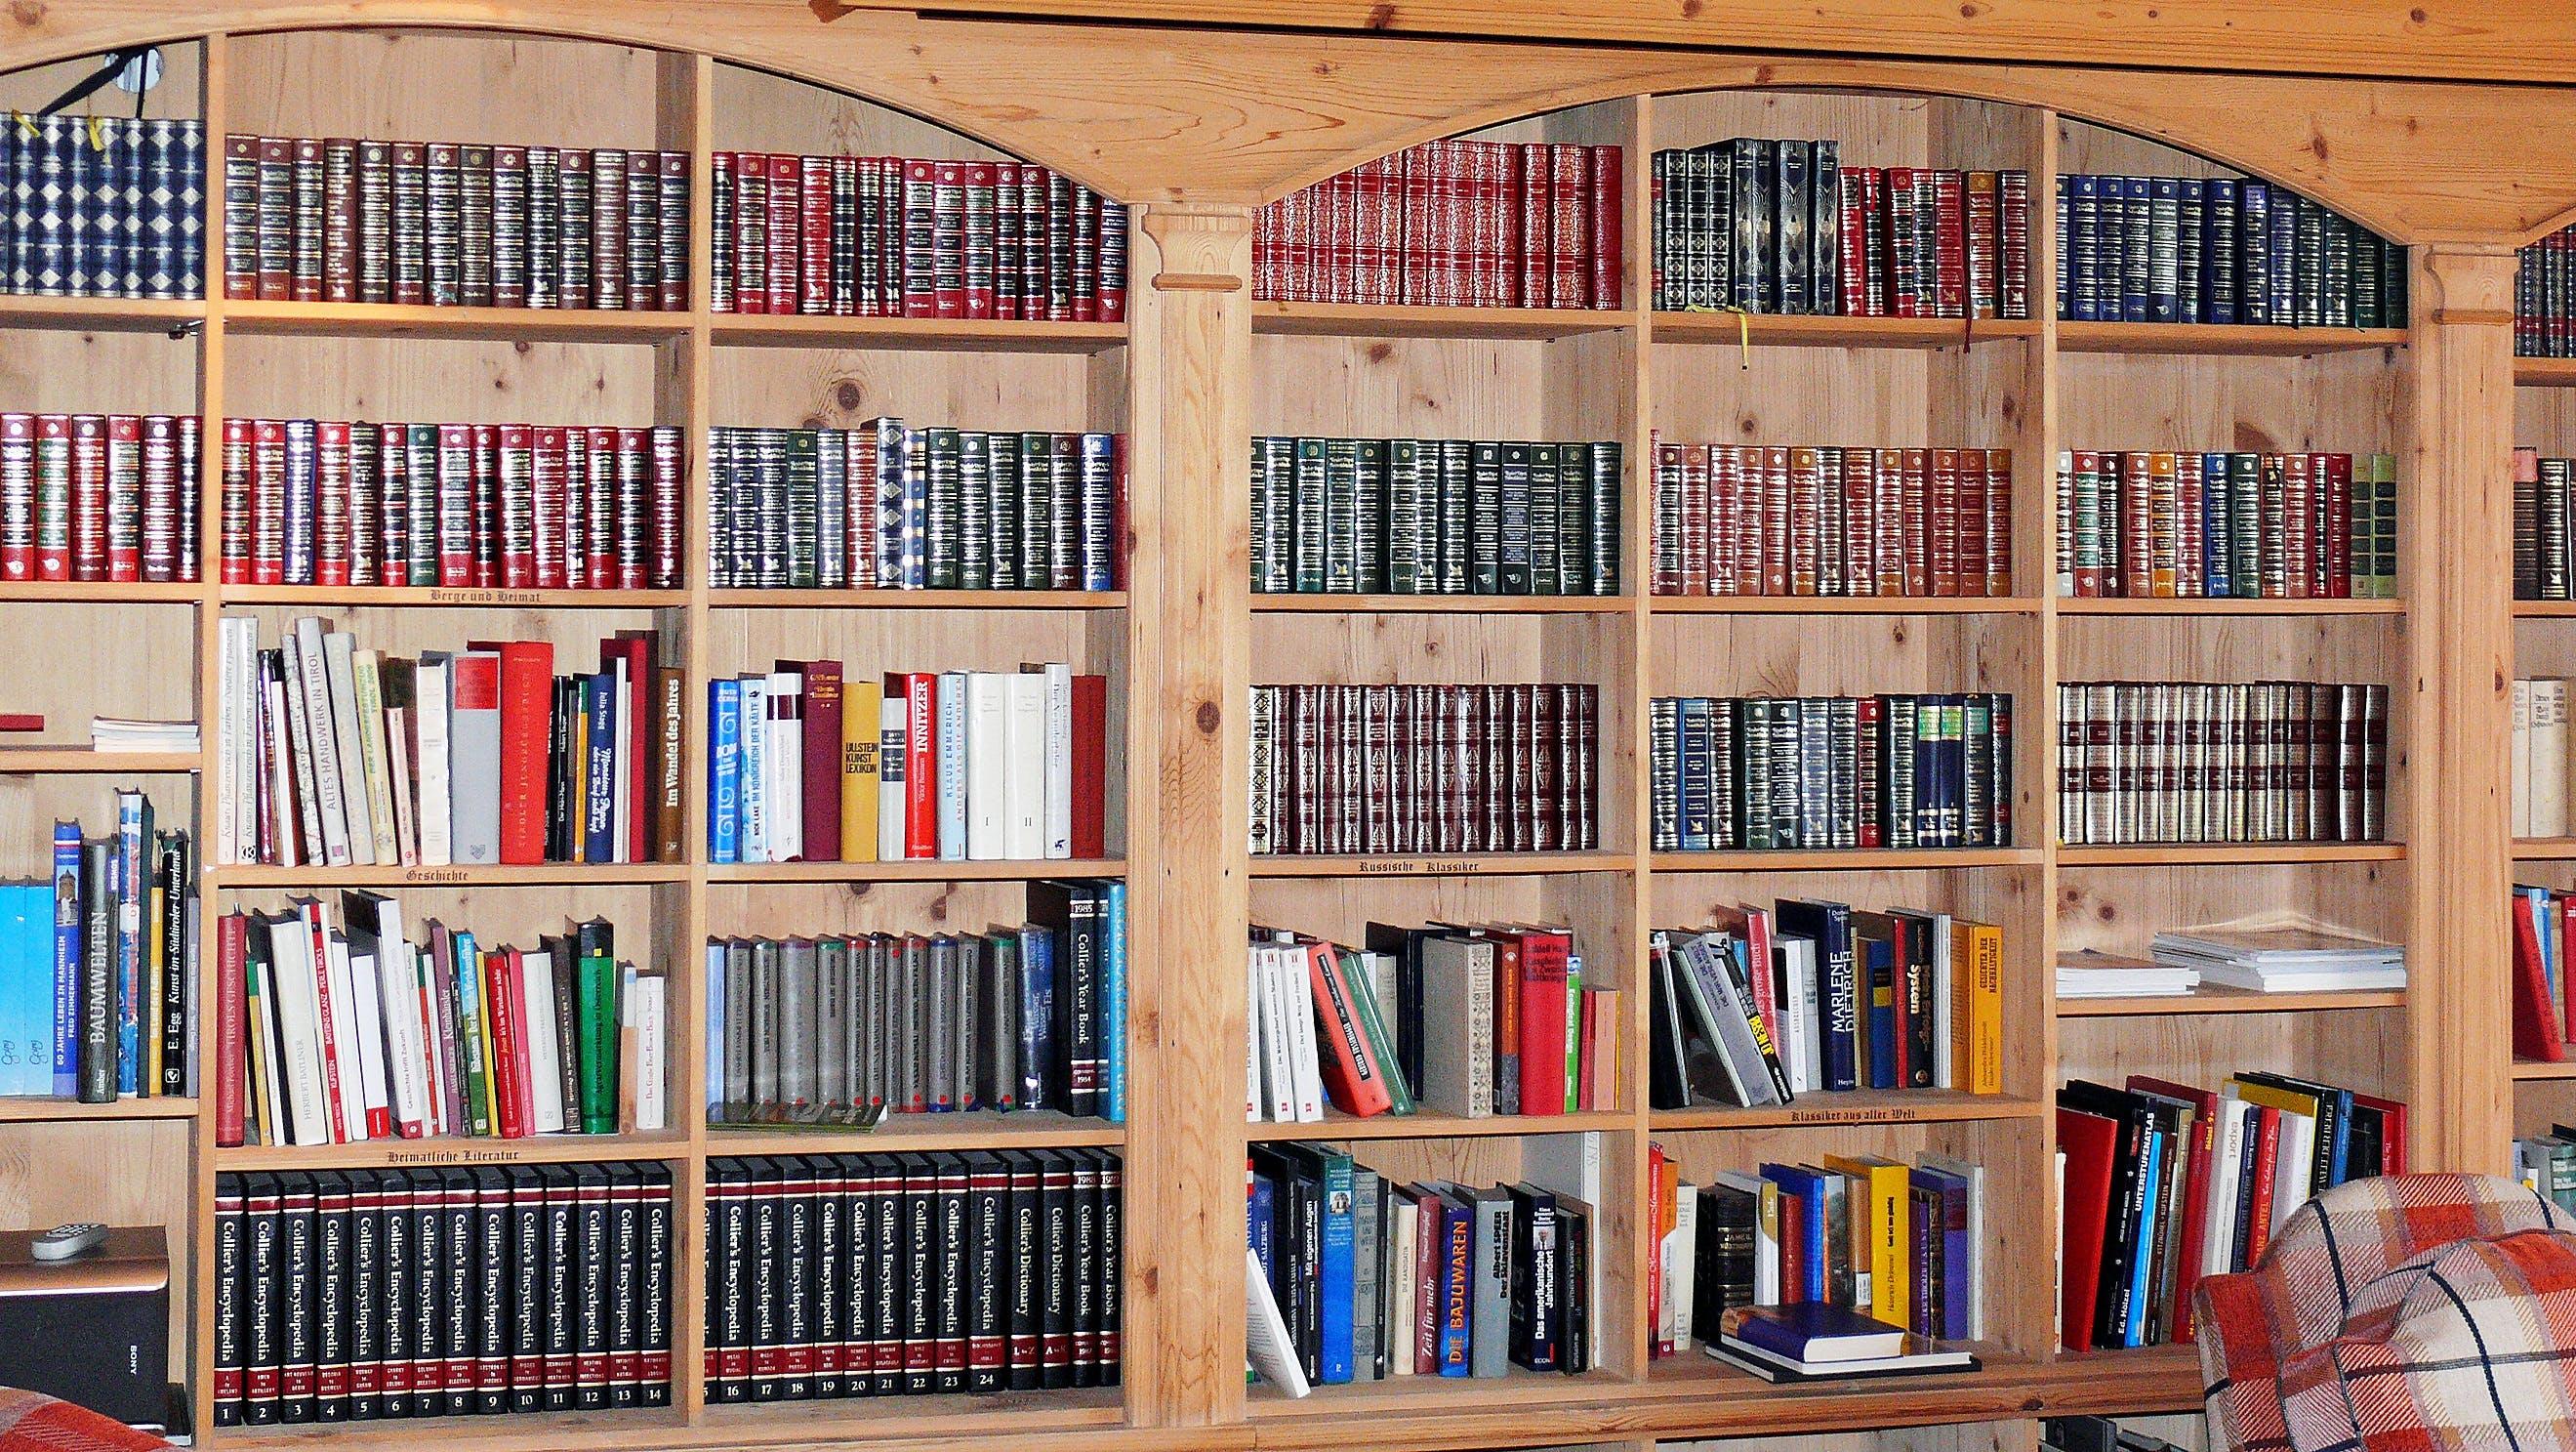 Encyclopedia File in Cabinet